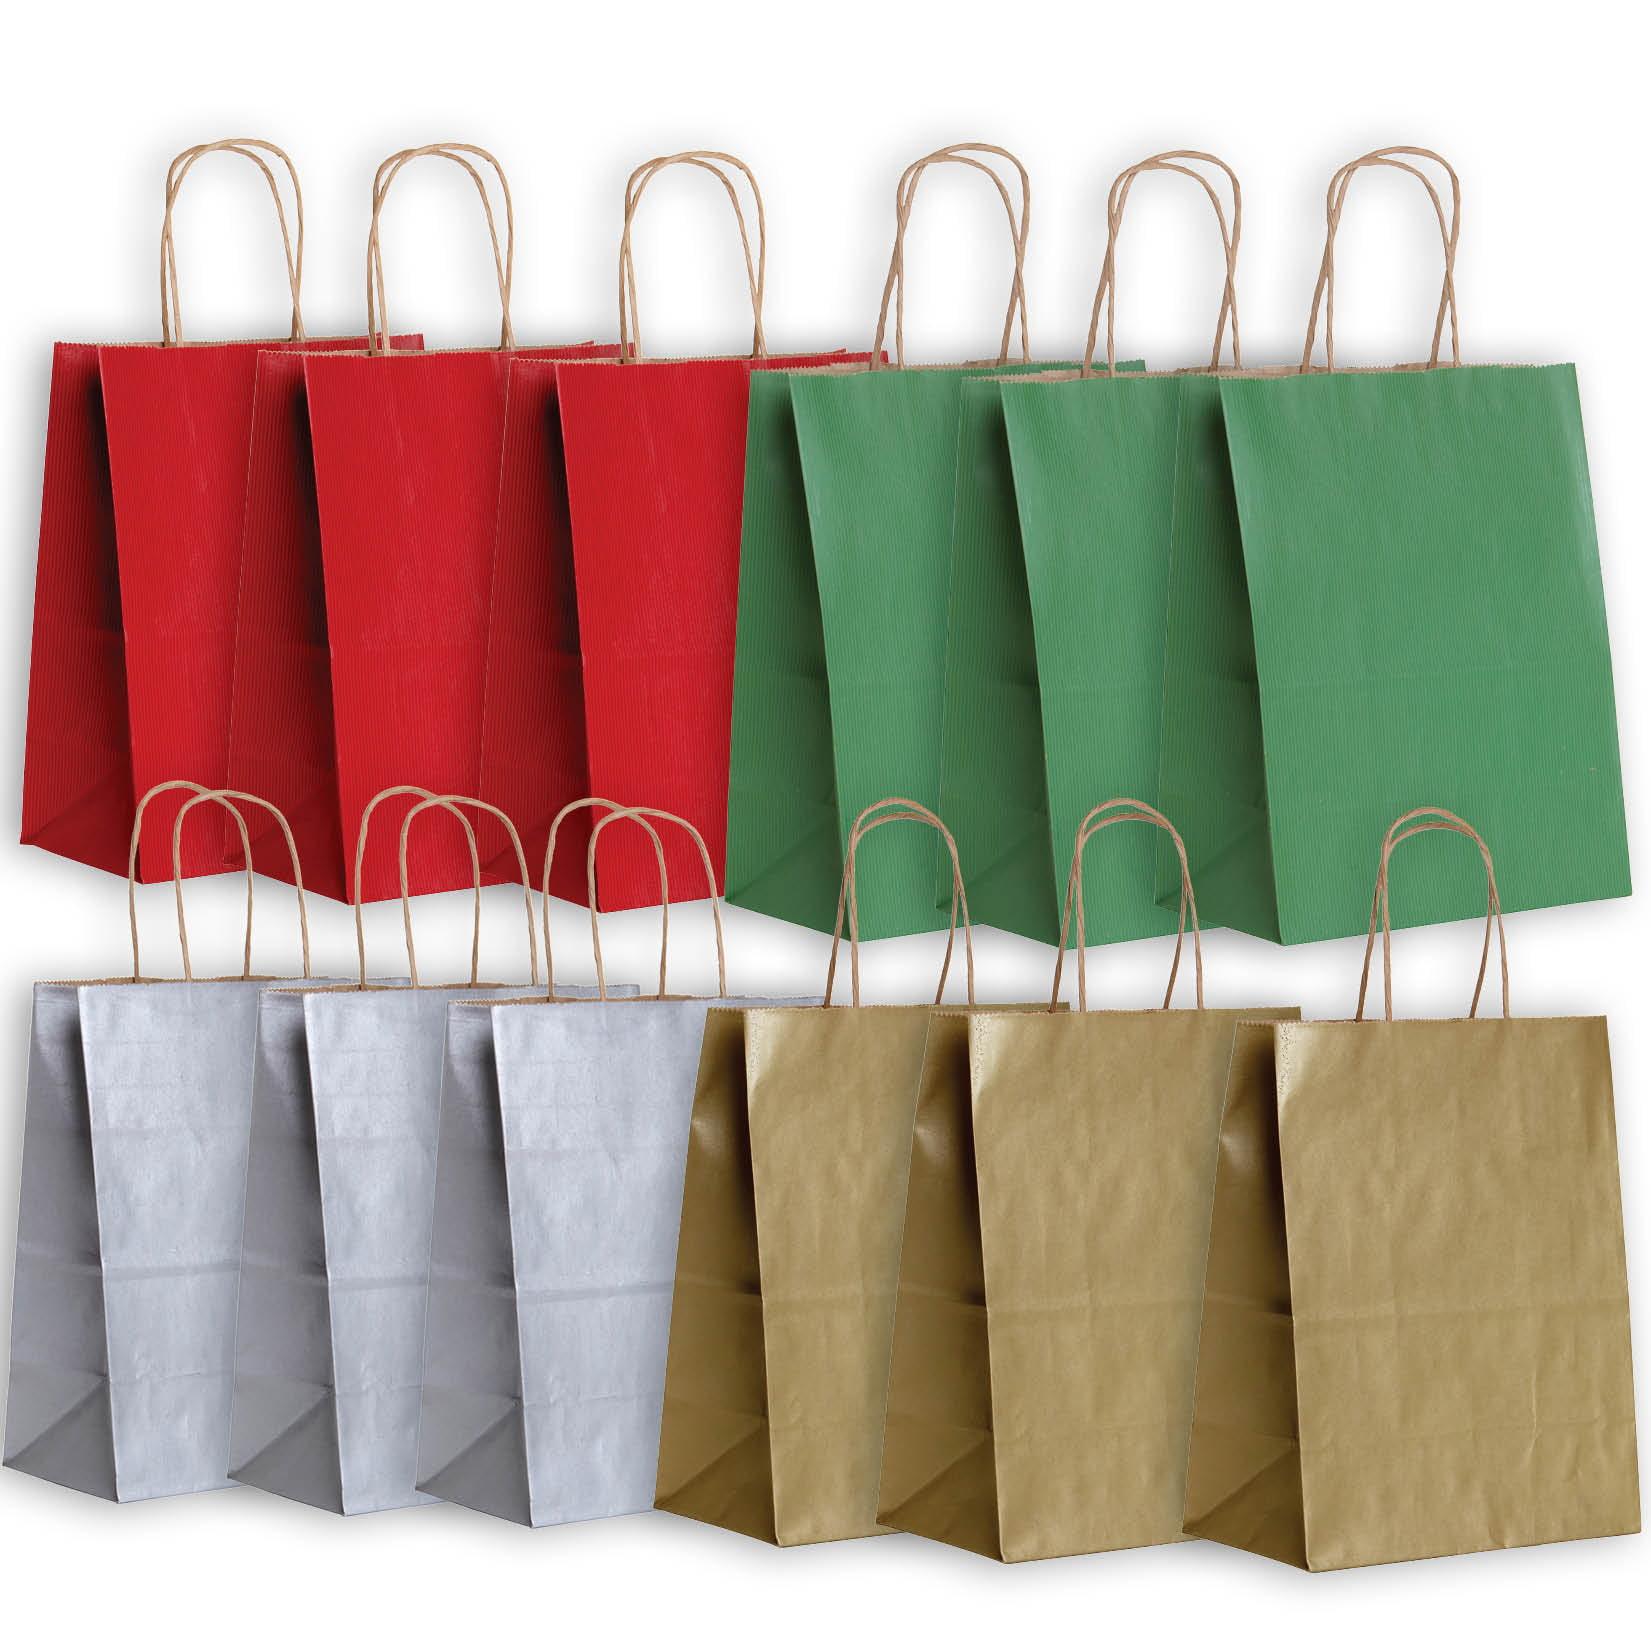 Jillson & Roberts Eco-Friendly Kraft Medium Gift Bag Assortment, Christmas (12 Bags)